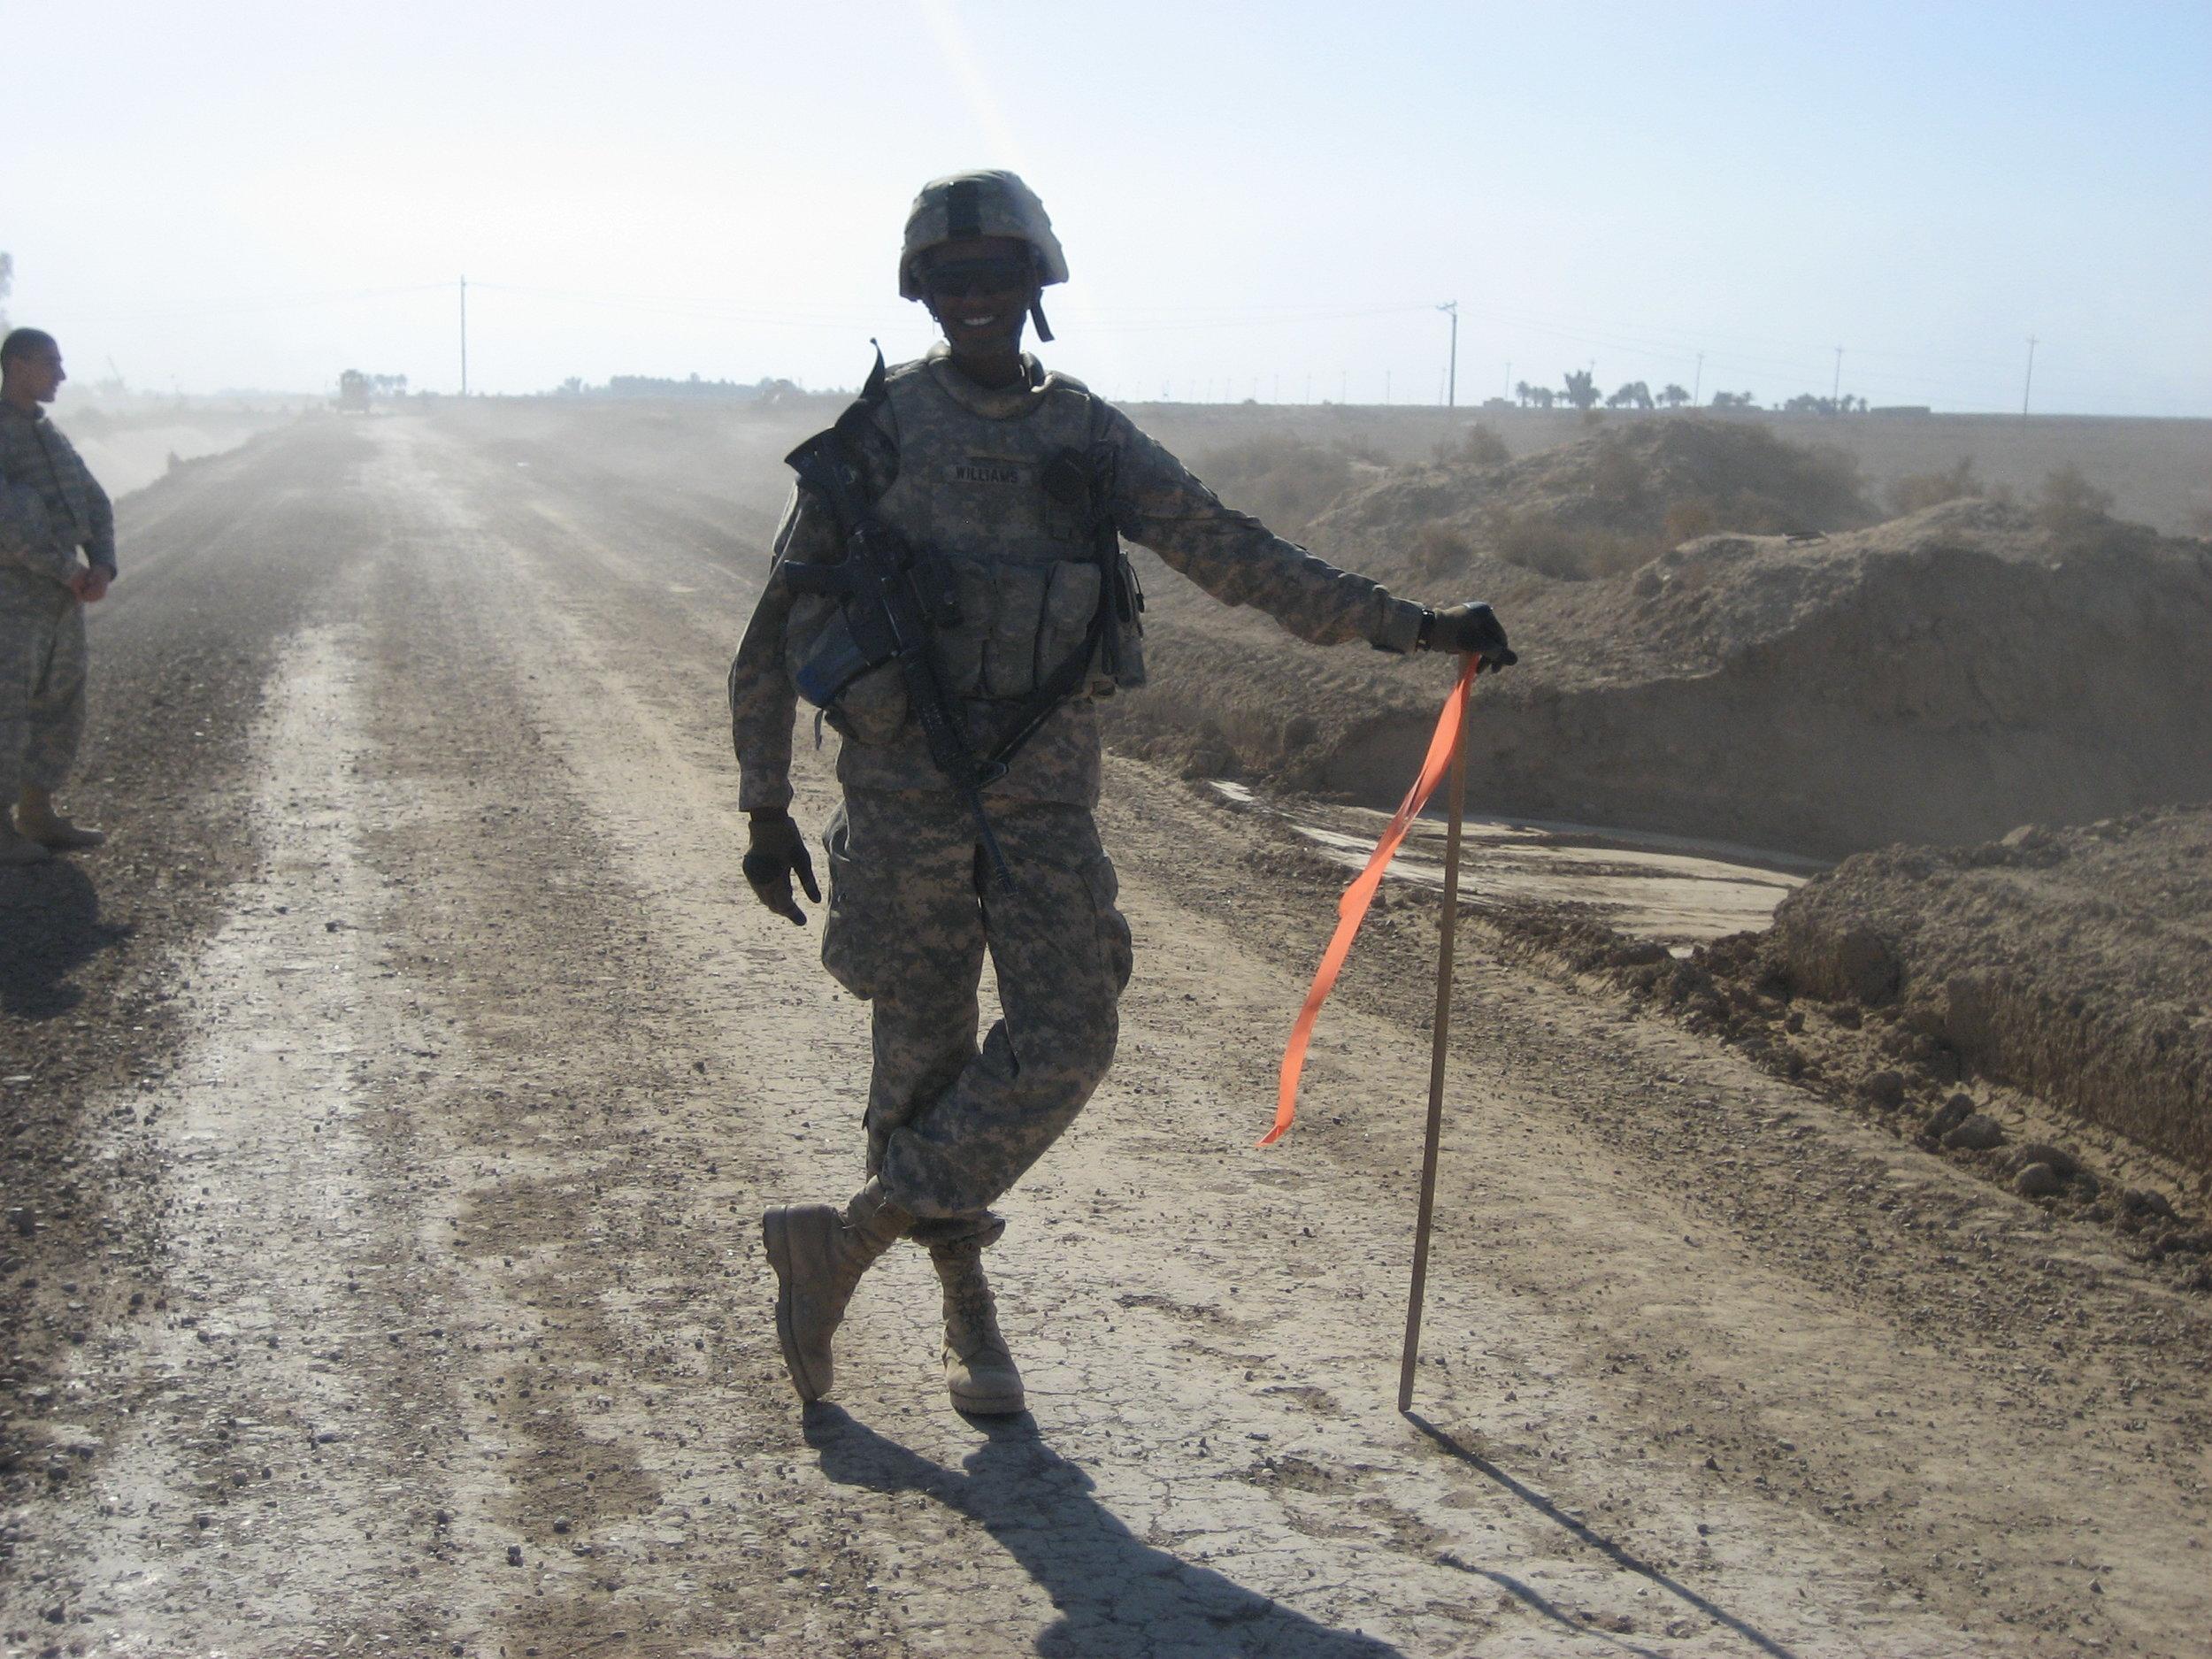 Blogpost Photo 1 (Rt Chargers - near Baqubah Iraq).JPG